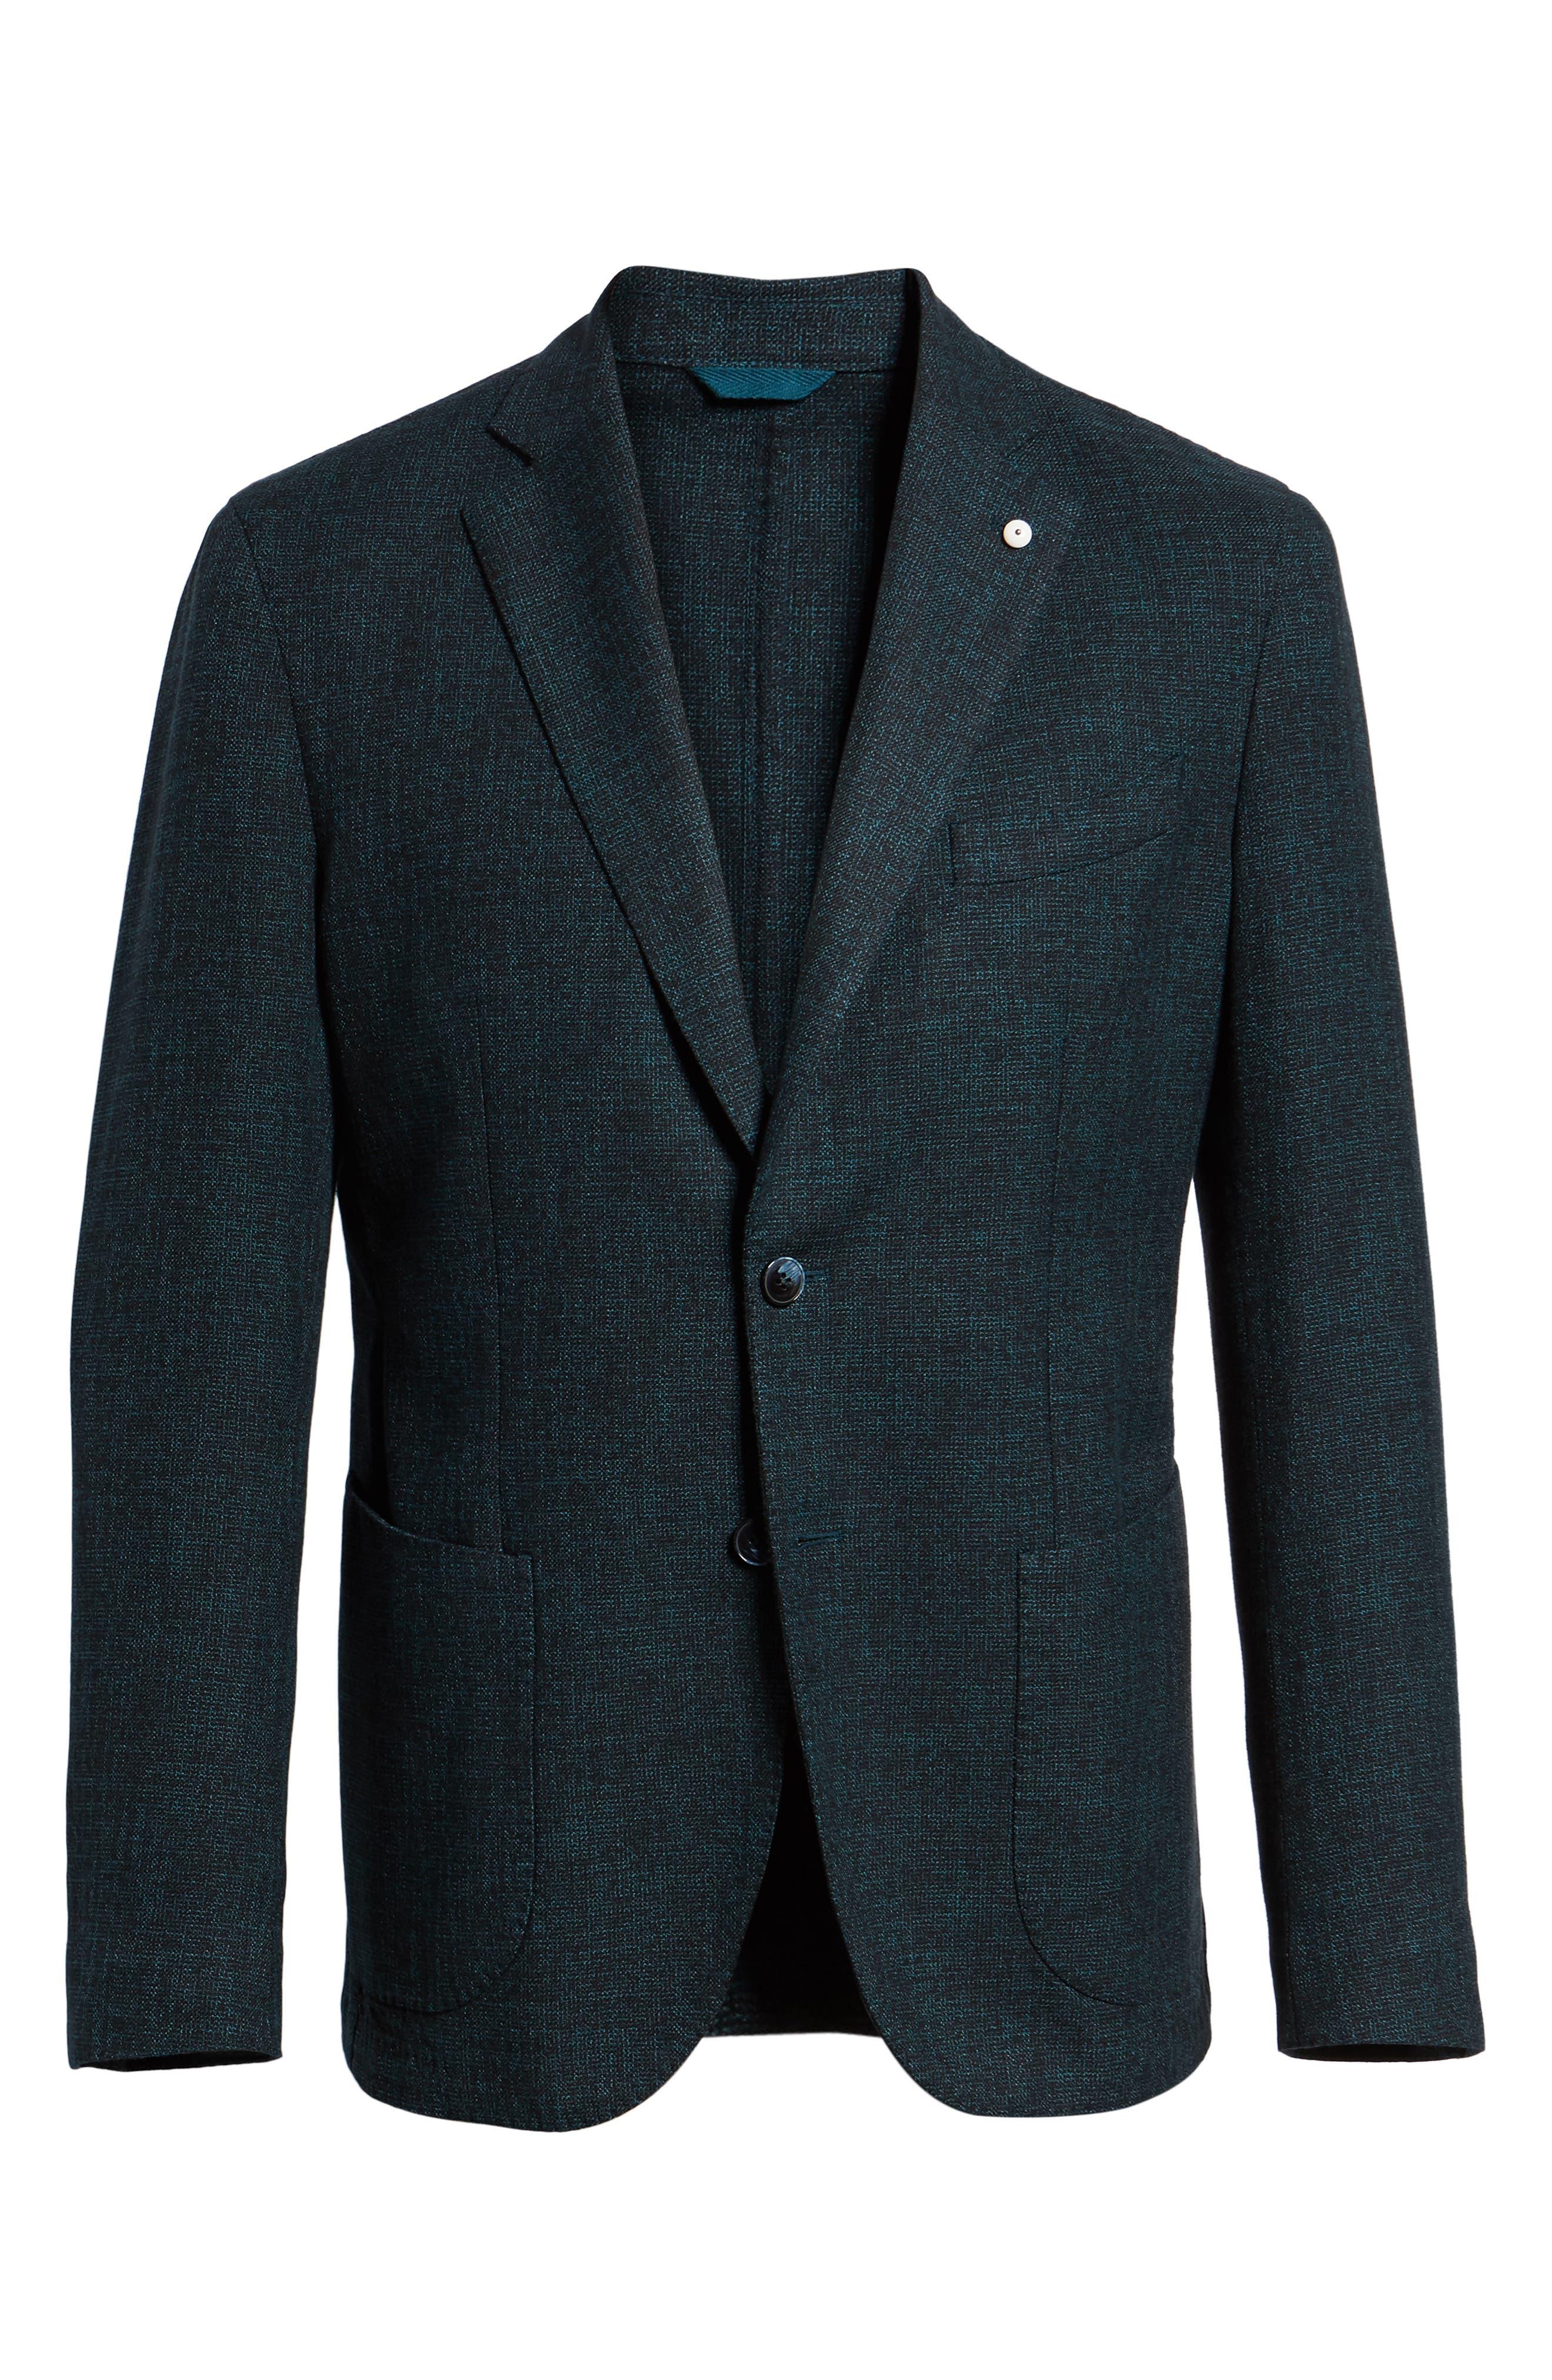 L.B.M 1911 Classic Fit Cotton & Wool Blazer,                             Alternate thumbnail 5, color,                             GREEN